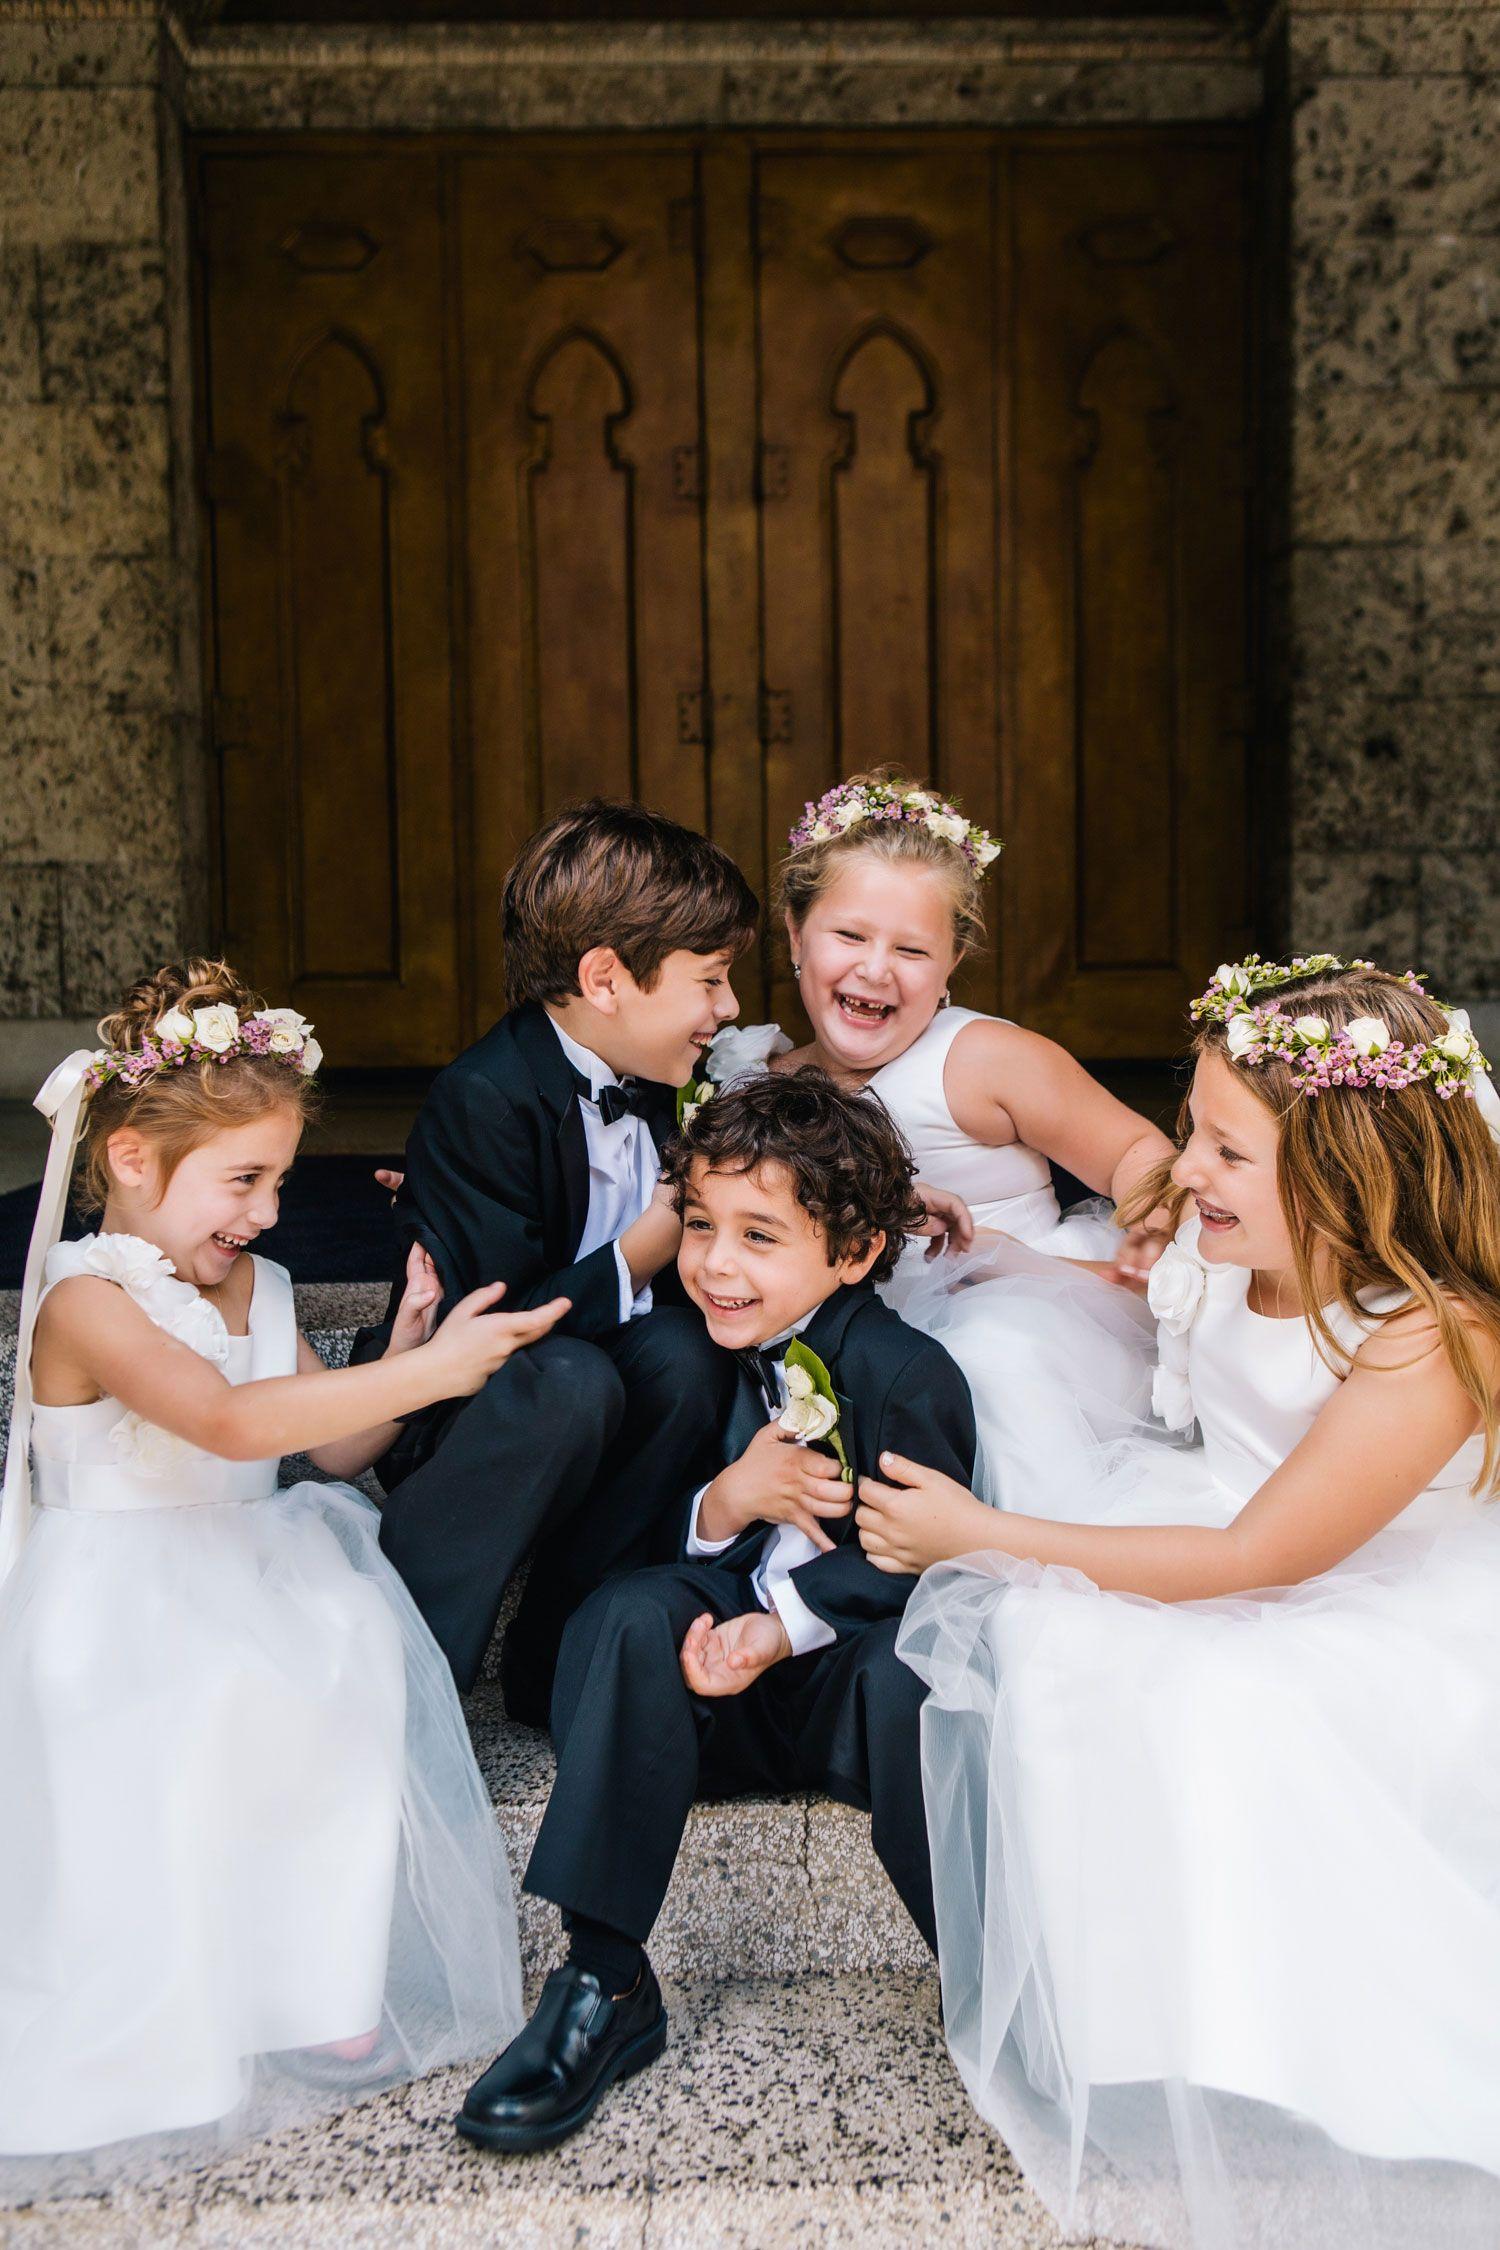 Adorable flower girl ring bearer outfit ideas wedding